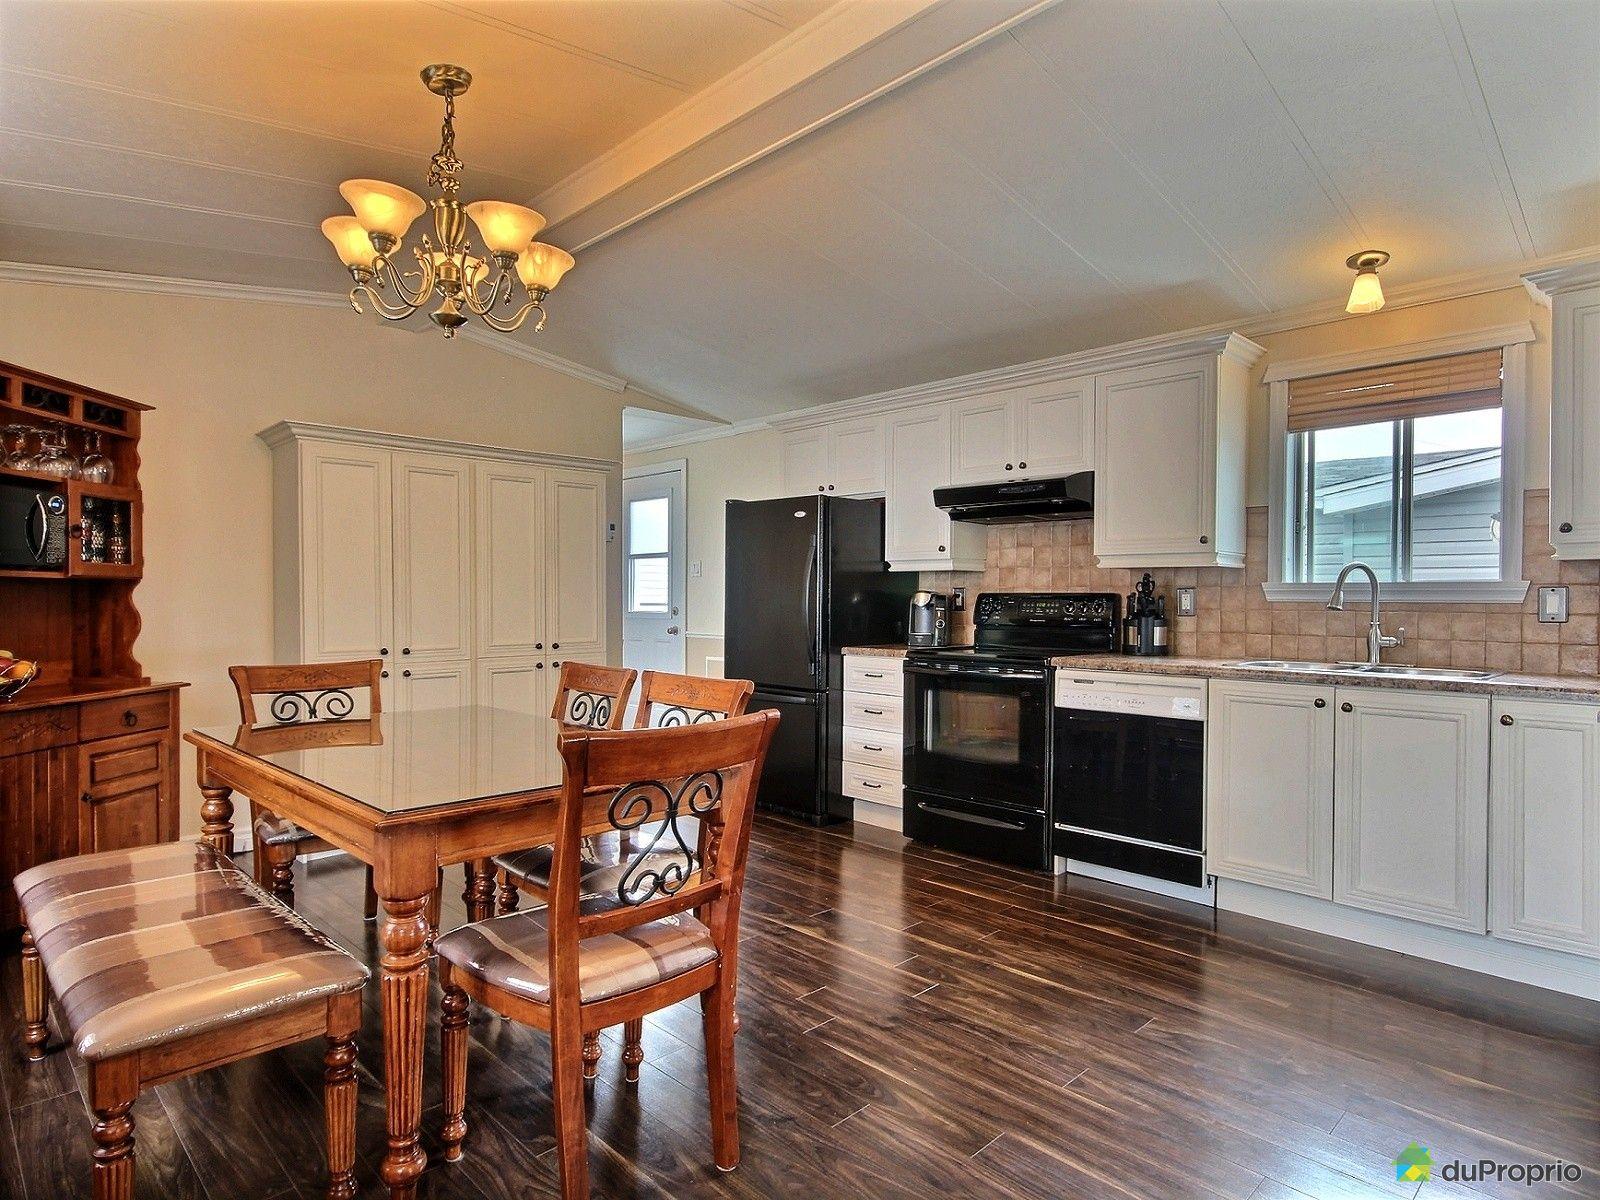 maison vendu lac st charles immobilier qu bec duproprio 619667. Black Bedroom Furniture Sets. Home Design Ideas